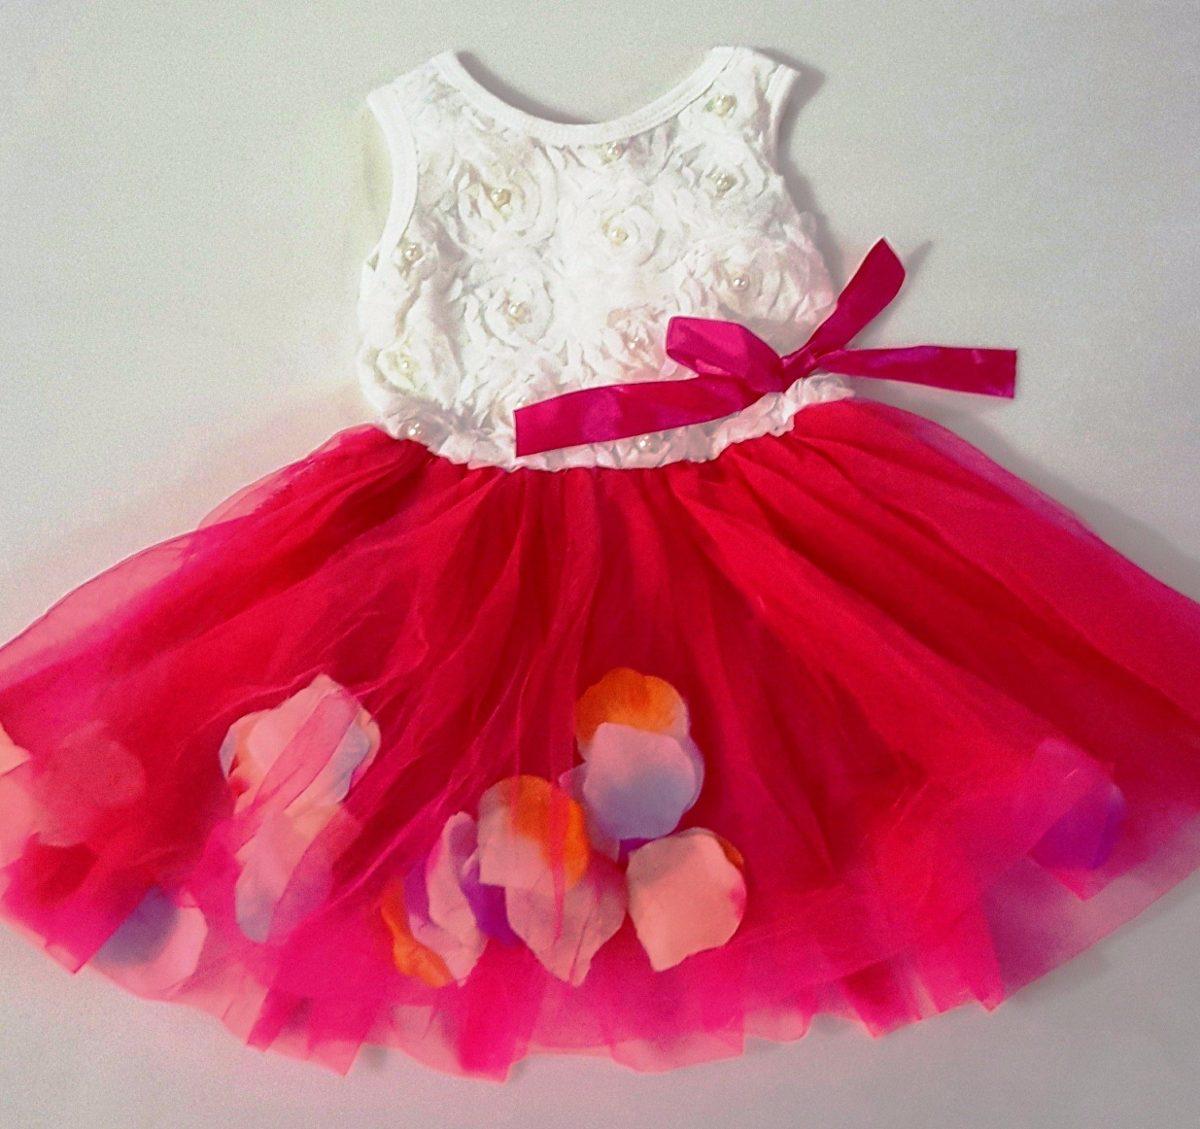 Vestidos de fiesta para bebes de 18 meses